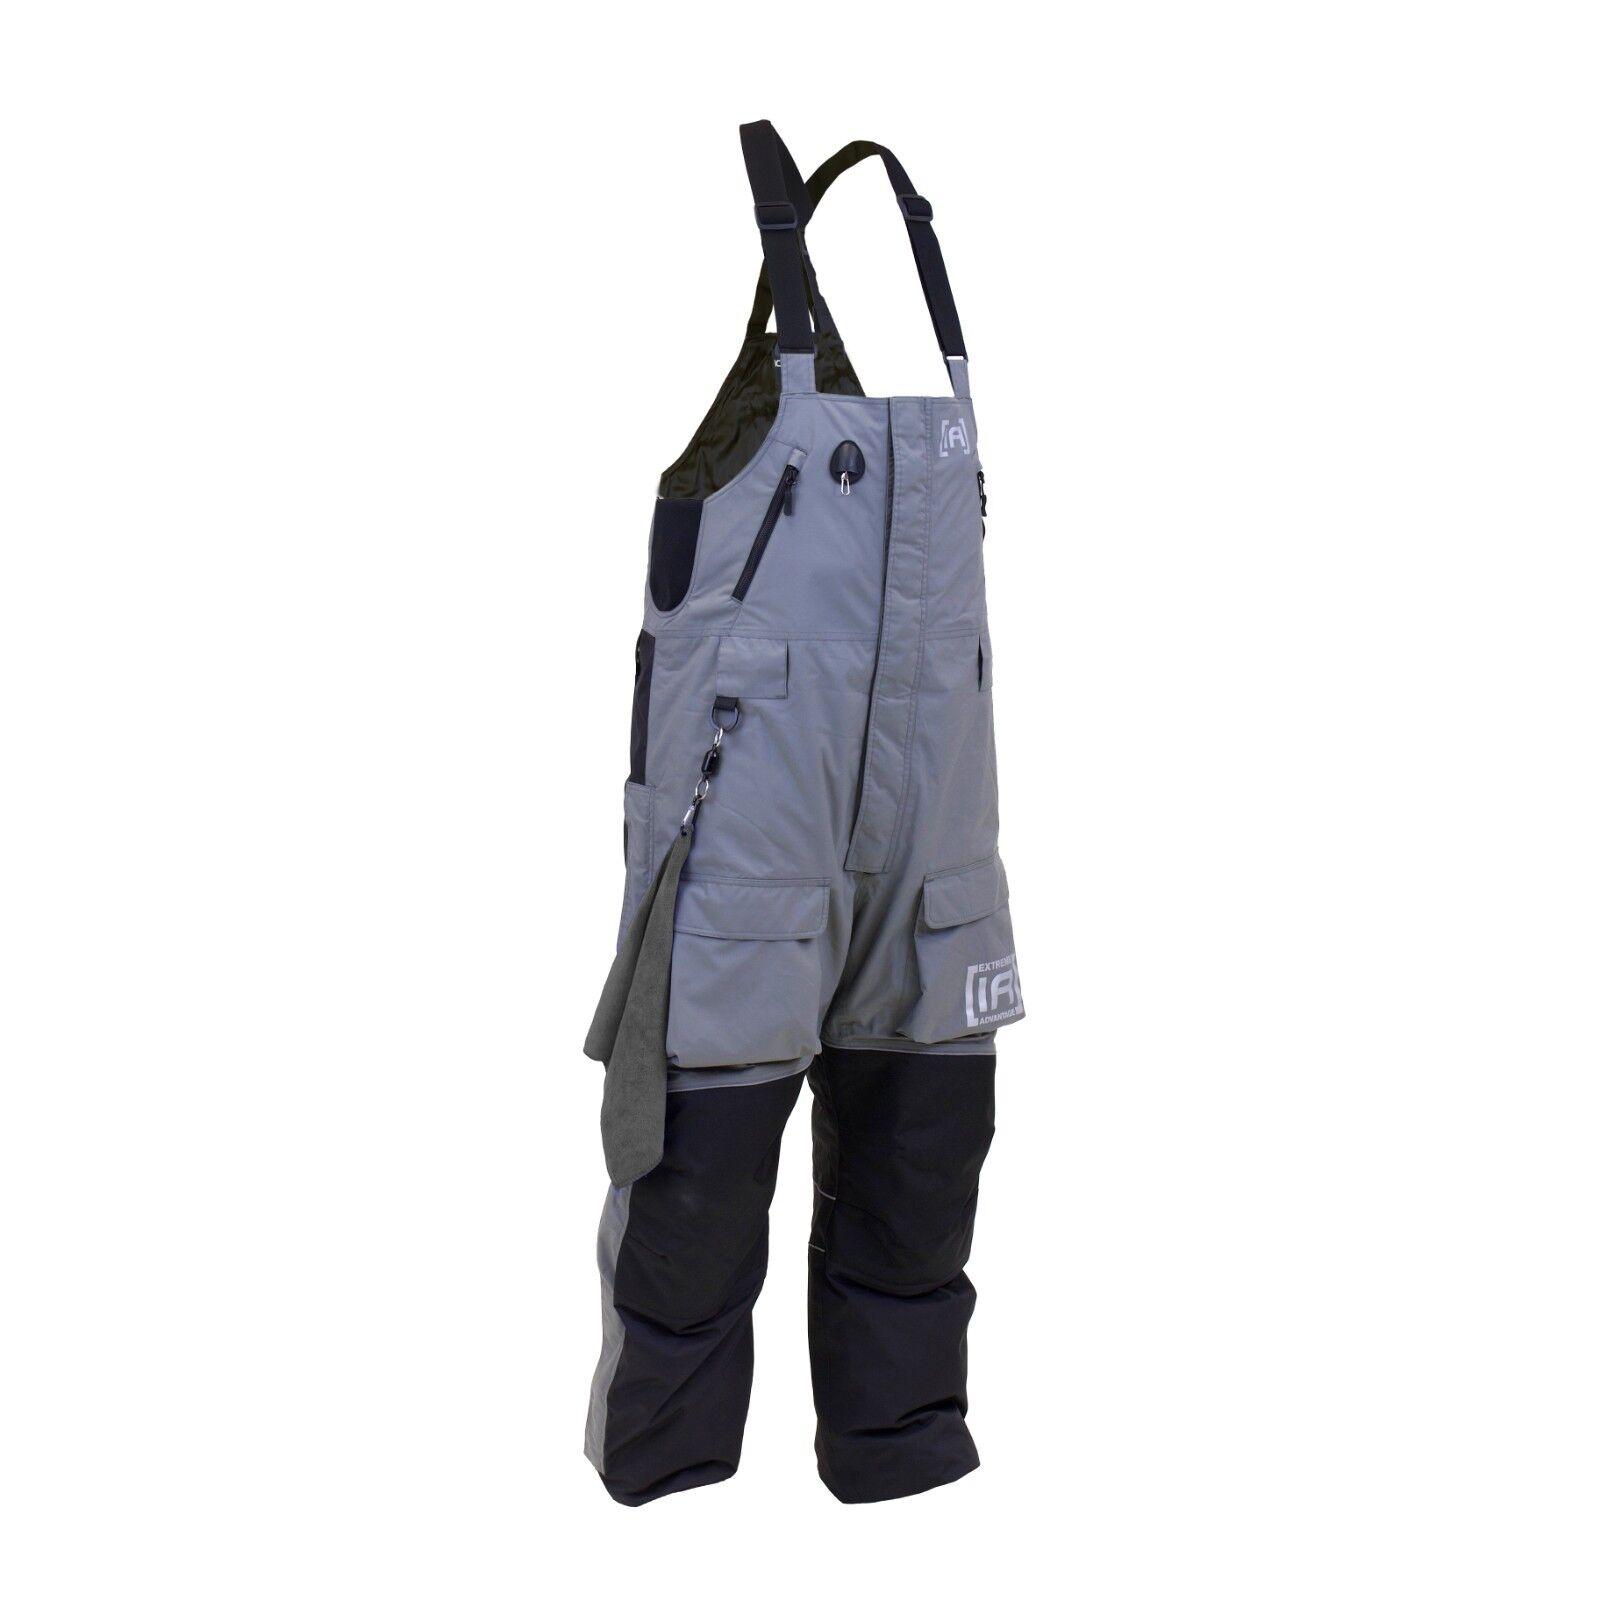 Clam IceArmor Men's  Extreme Advantage Ice Fishing Bibs  online discount